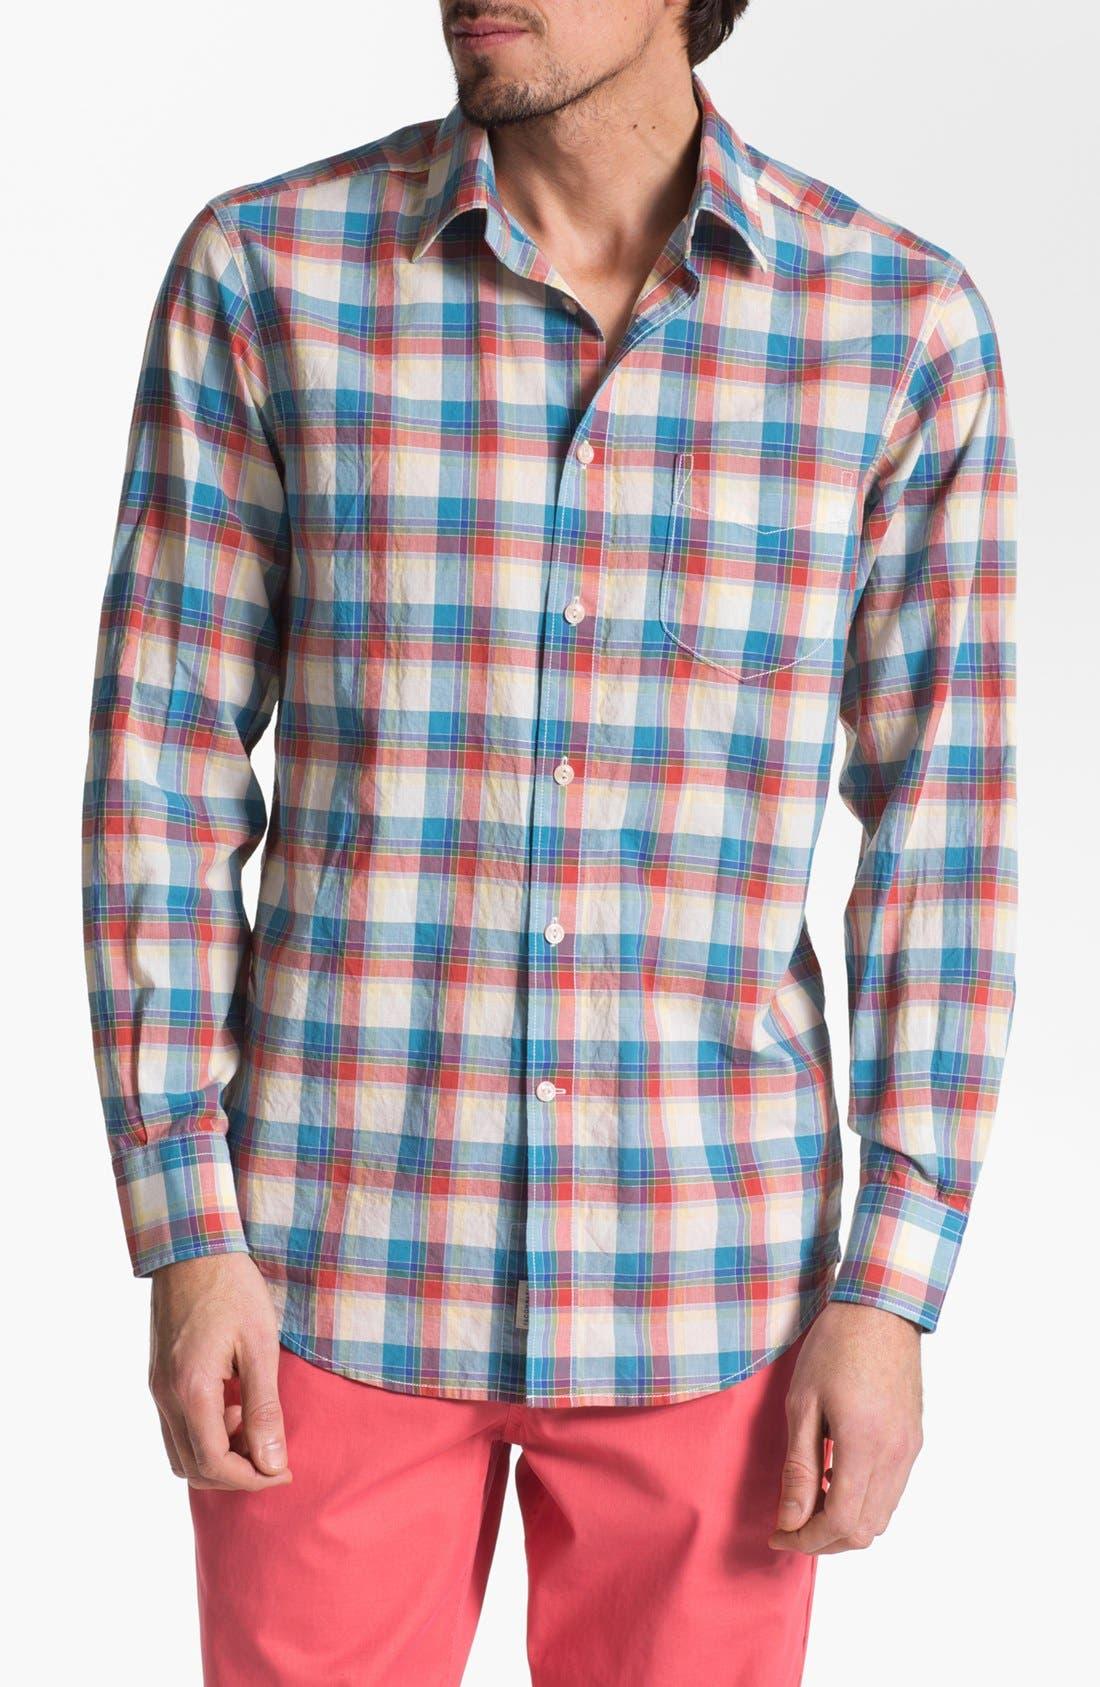 Alternate Image 1 Selected - Façonnable Tailored Denim Plaid Sport Shirt